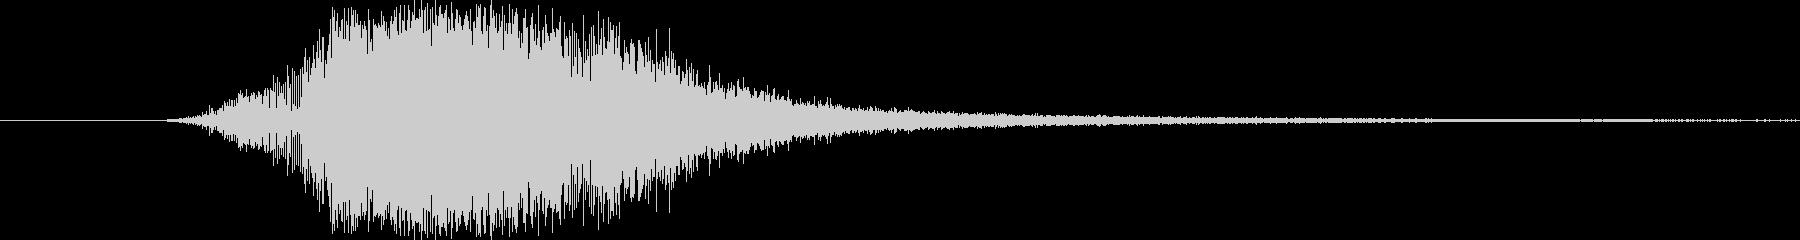 SHARPKNIFE VERSION 5の未再生の波形